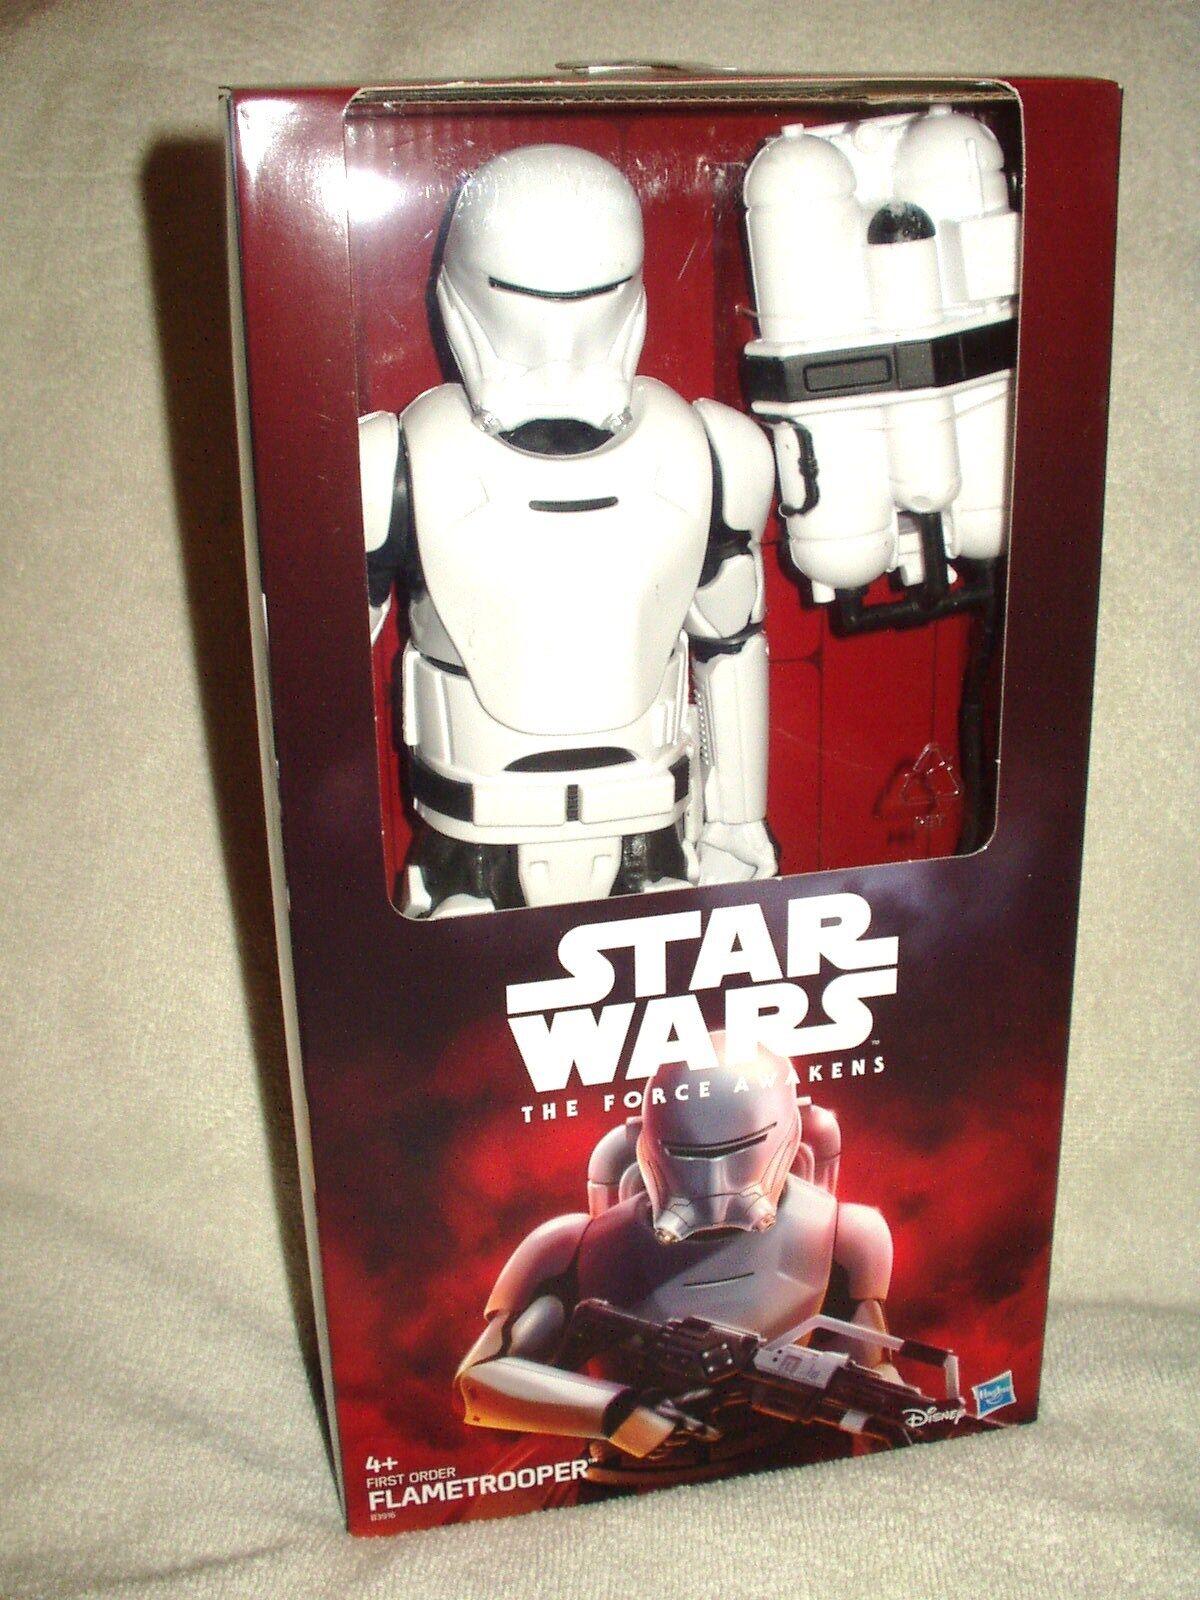 Action Figure Star Wars The Force Awakens Flametrooper 12 inch